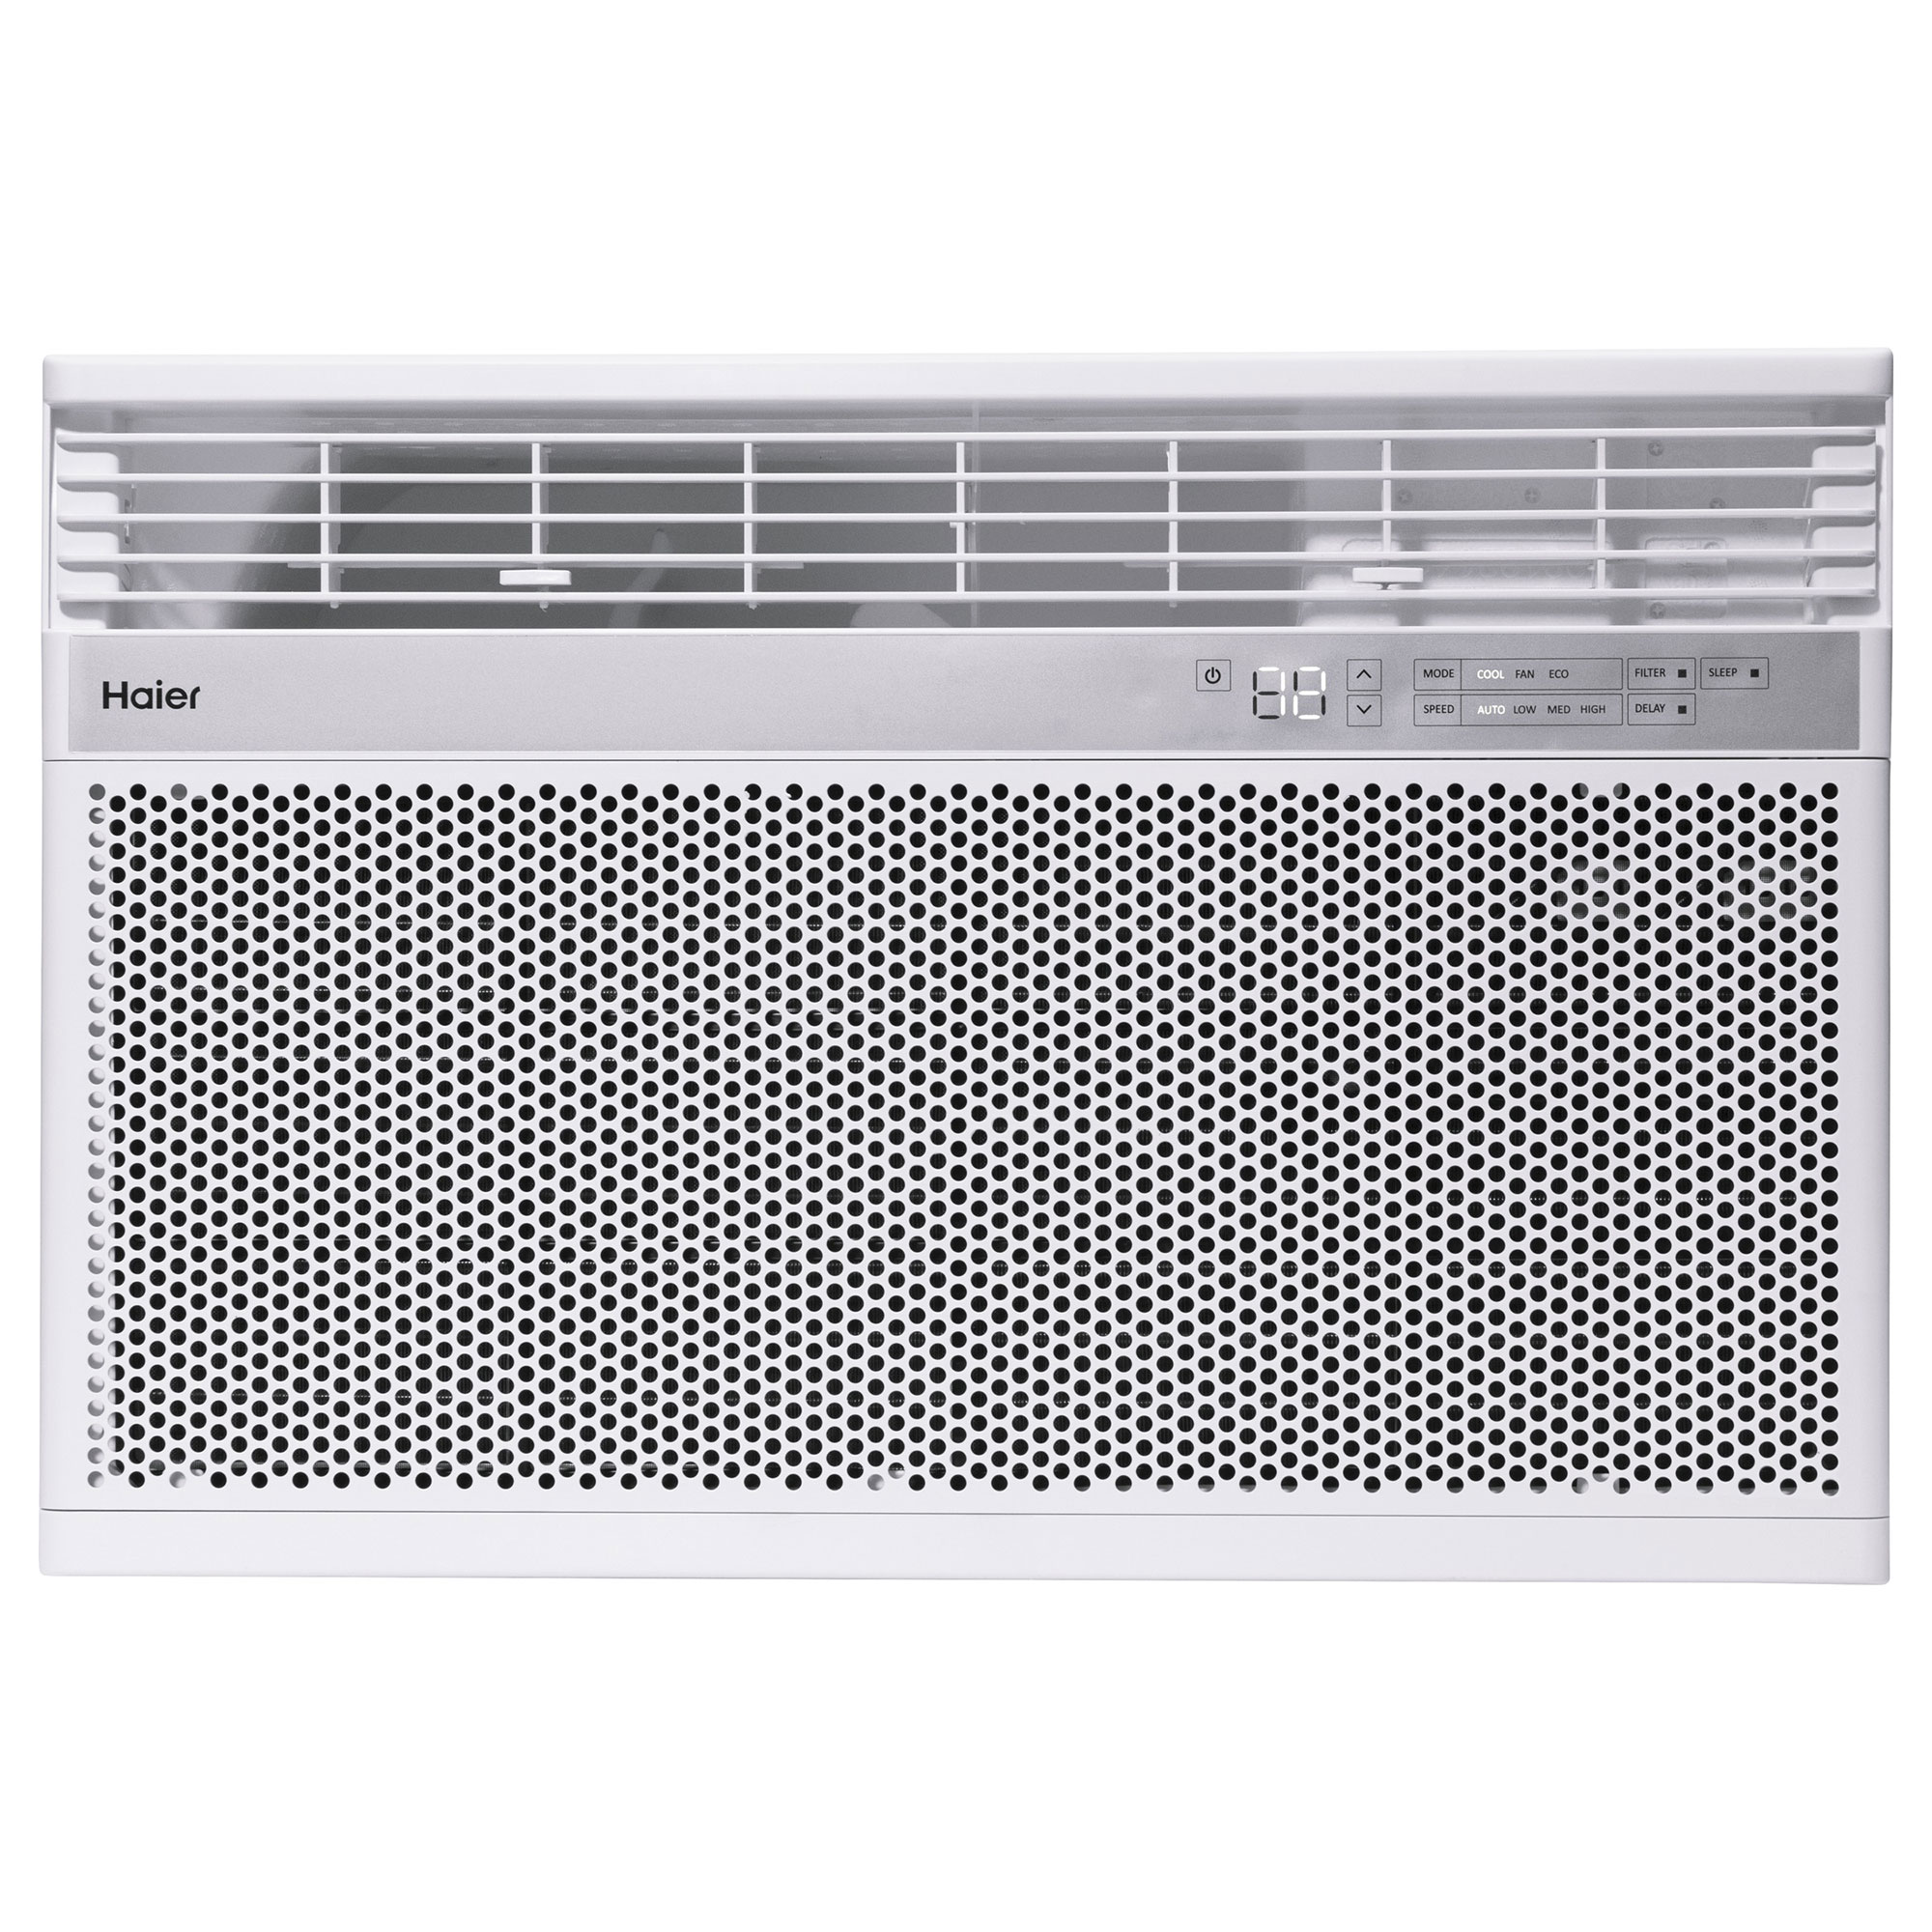 Haier Energy Star QHM12AX 11,600 BTU 11.8 CEER 115 V Electronic Air Conditioner